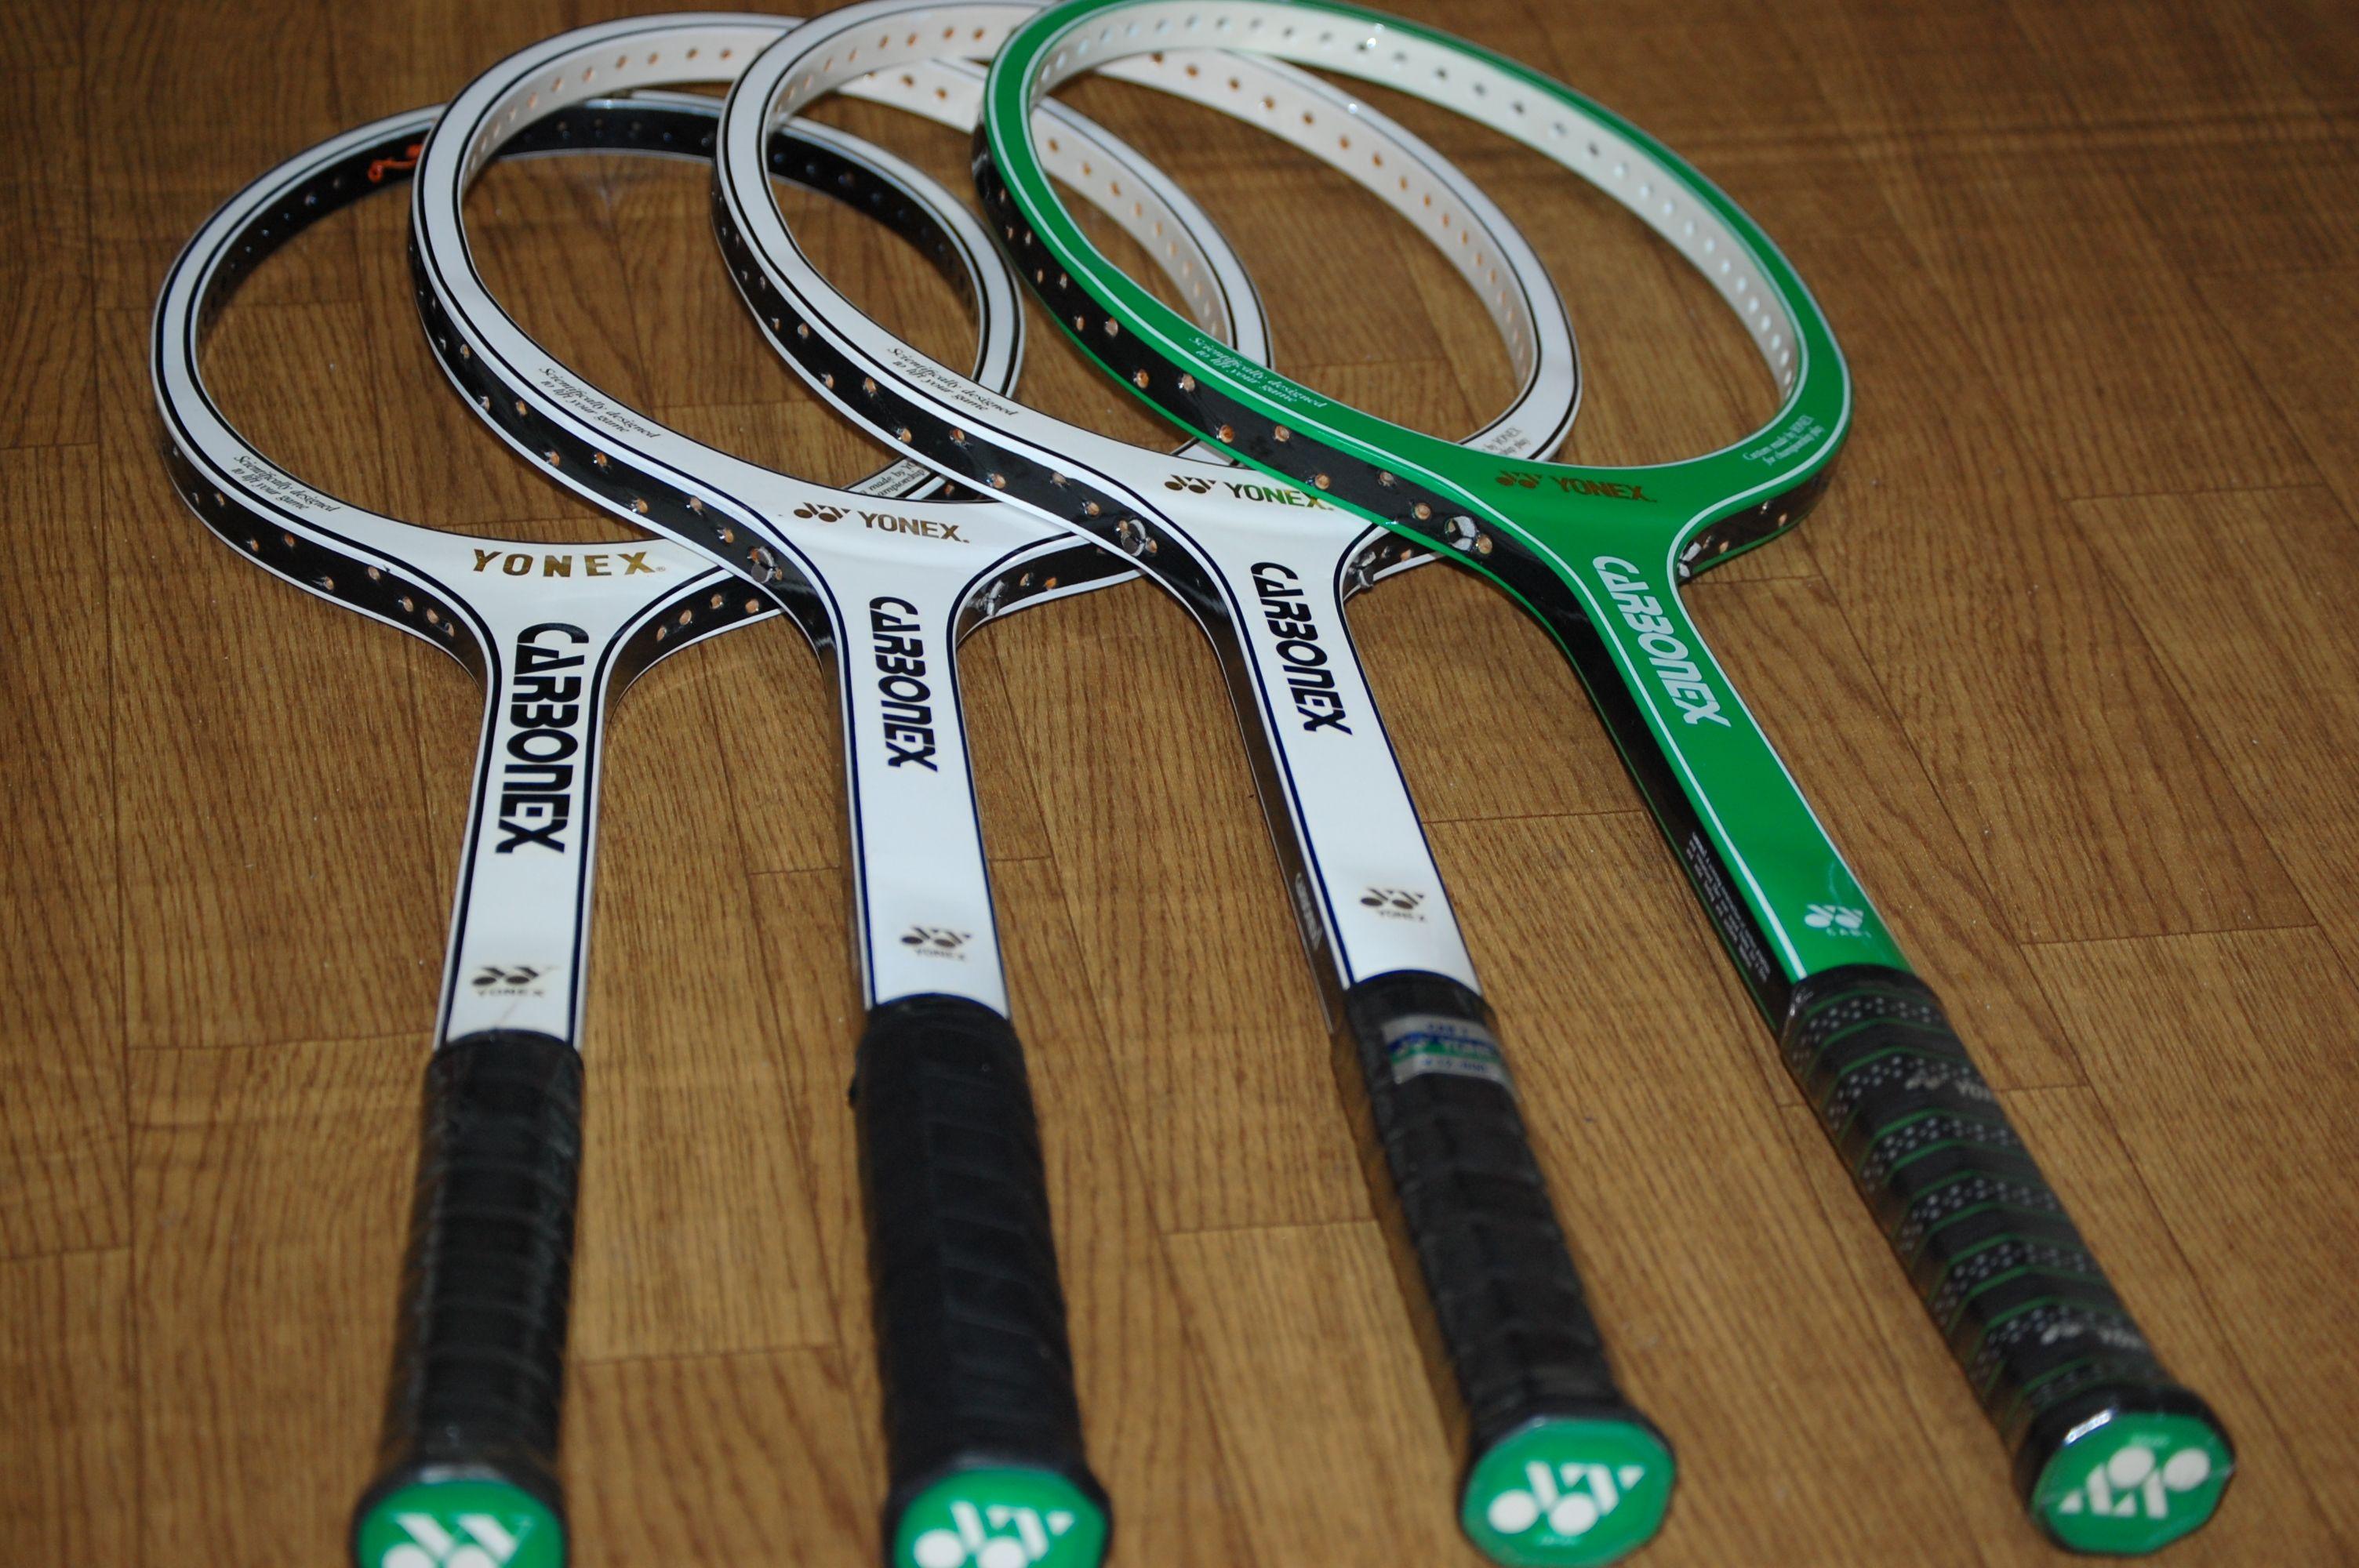 Yonex Carbonex Tennis Racket Rackets Racquets